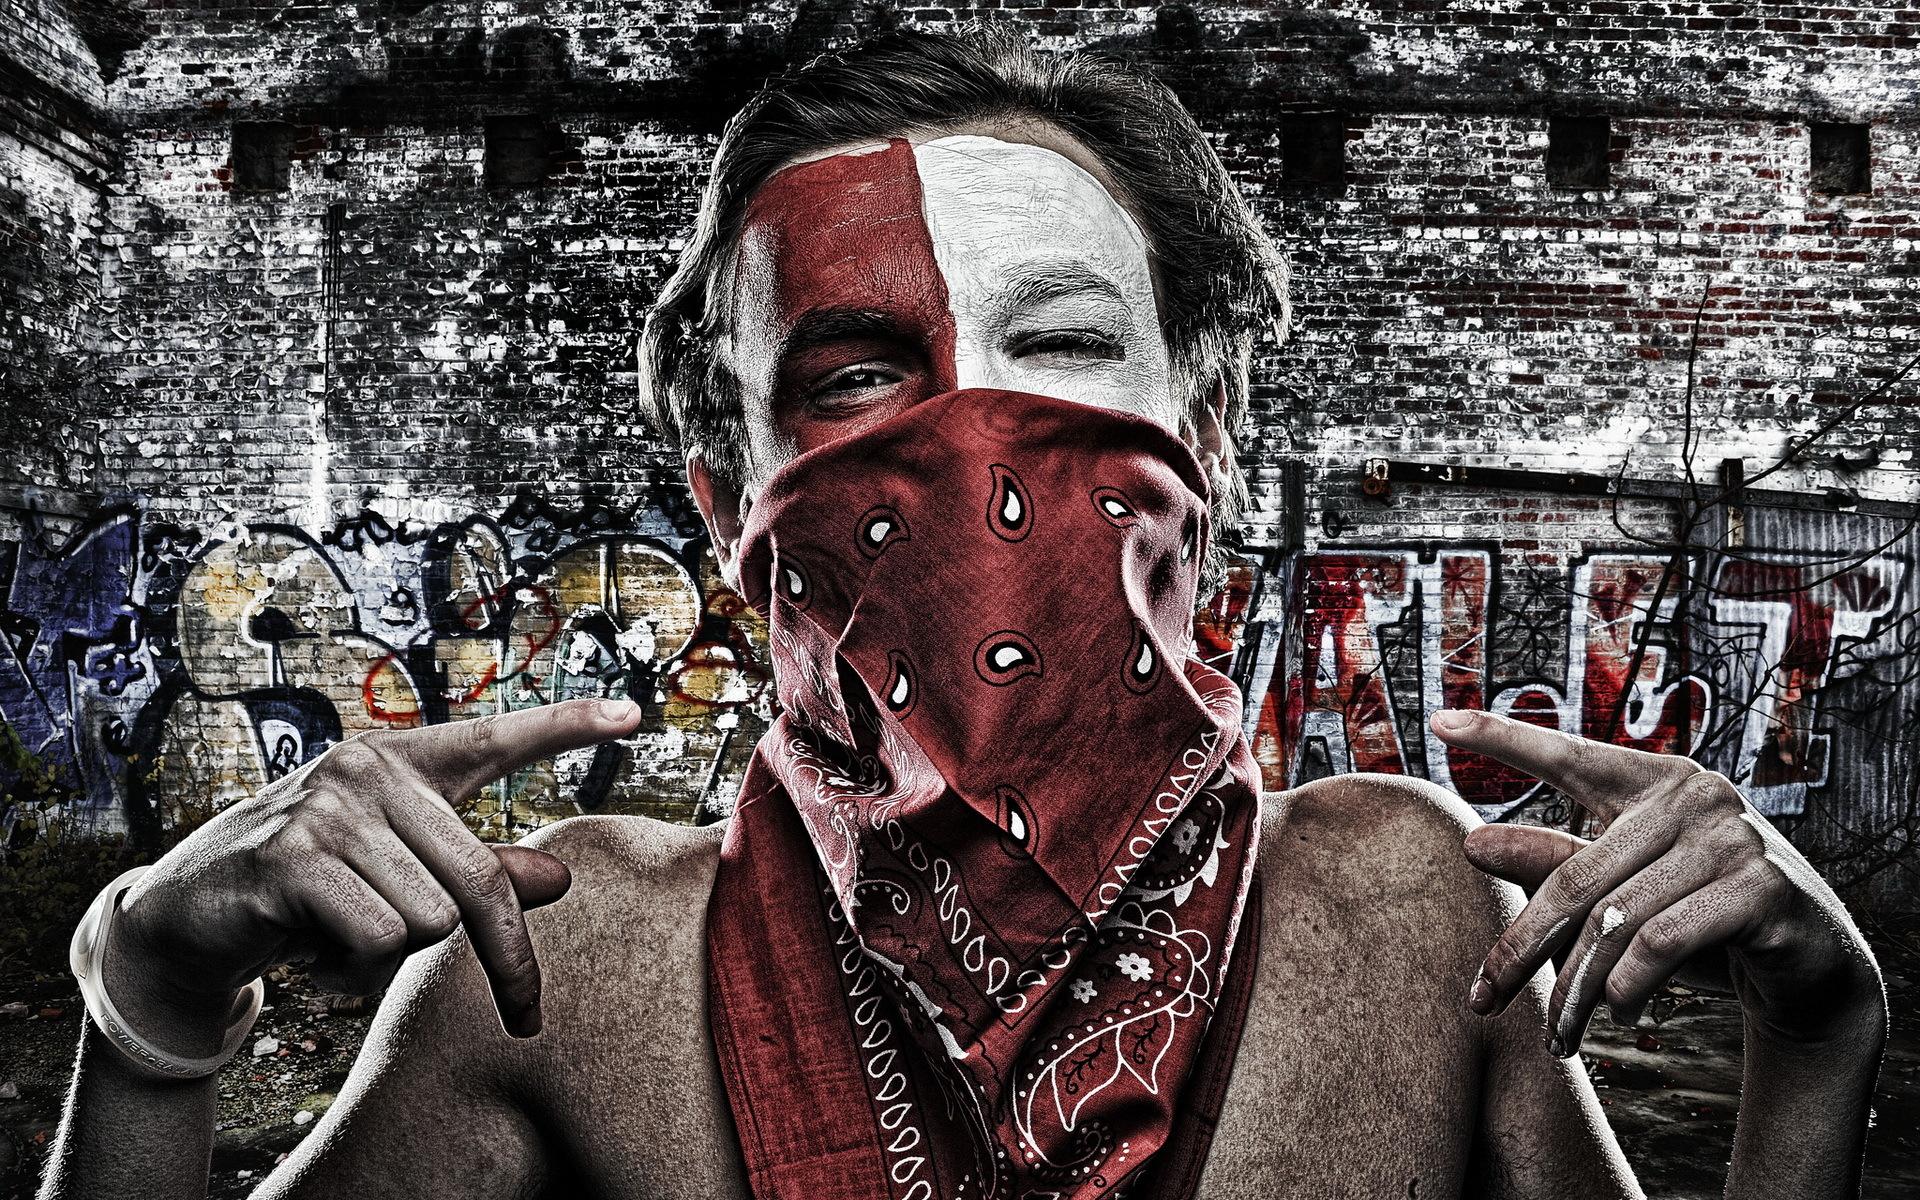 Bandana Eye Mask Men Males Urban Mask Bandana